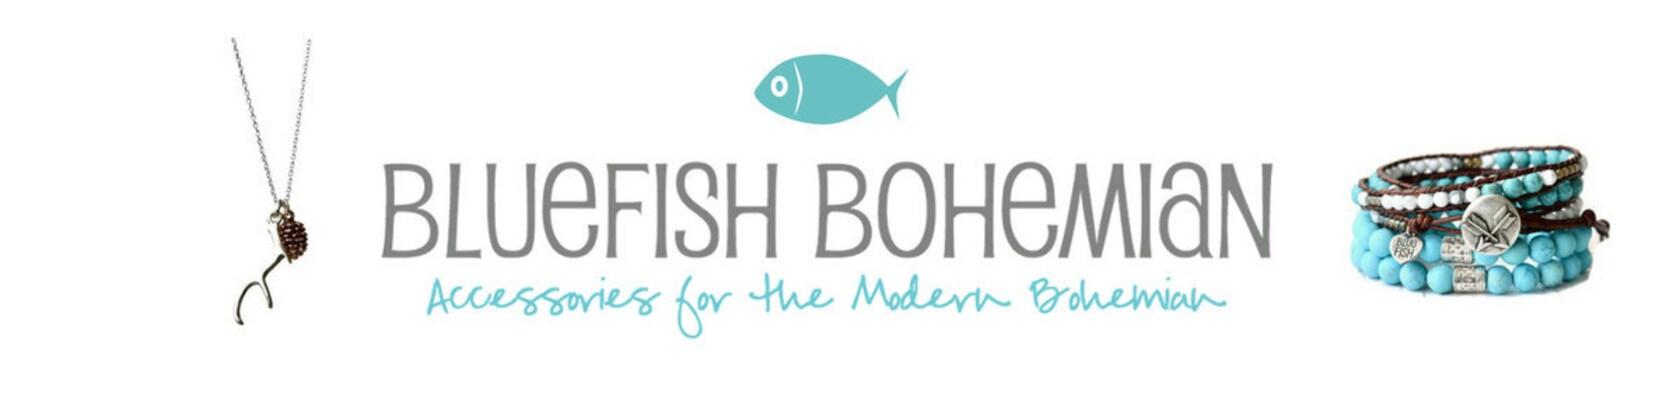 BluefishBohemian